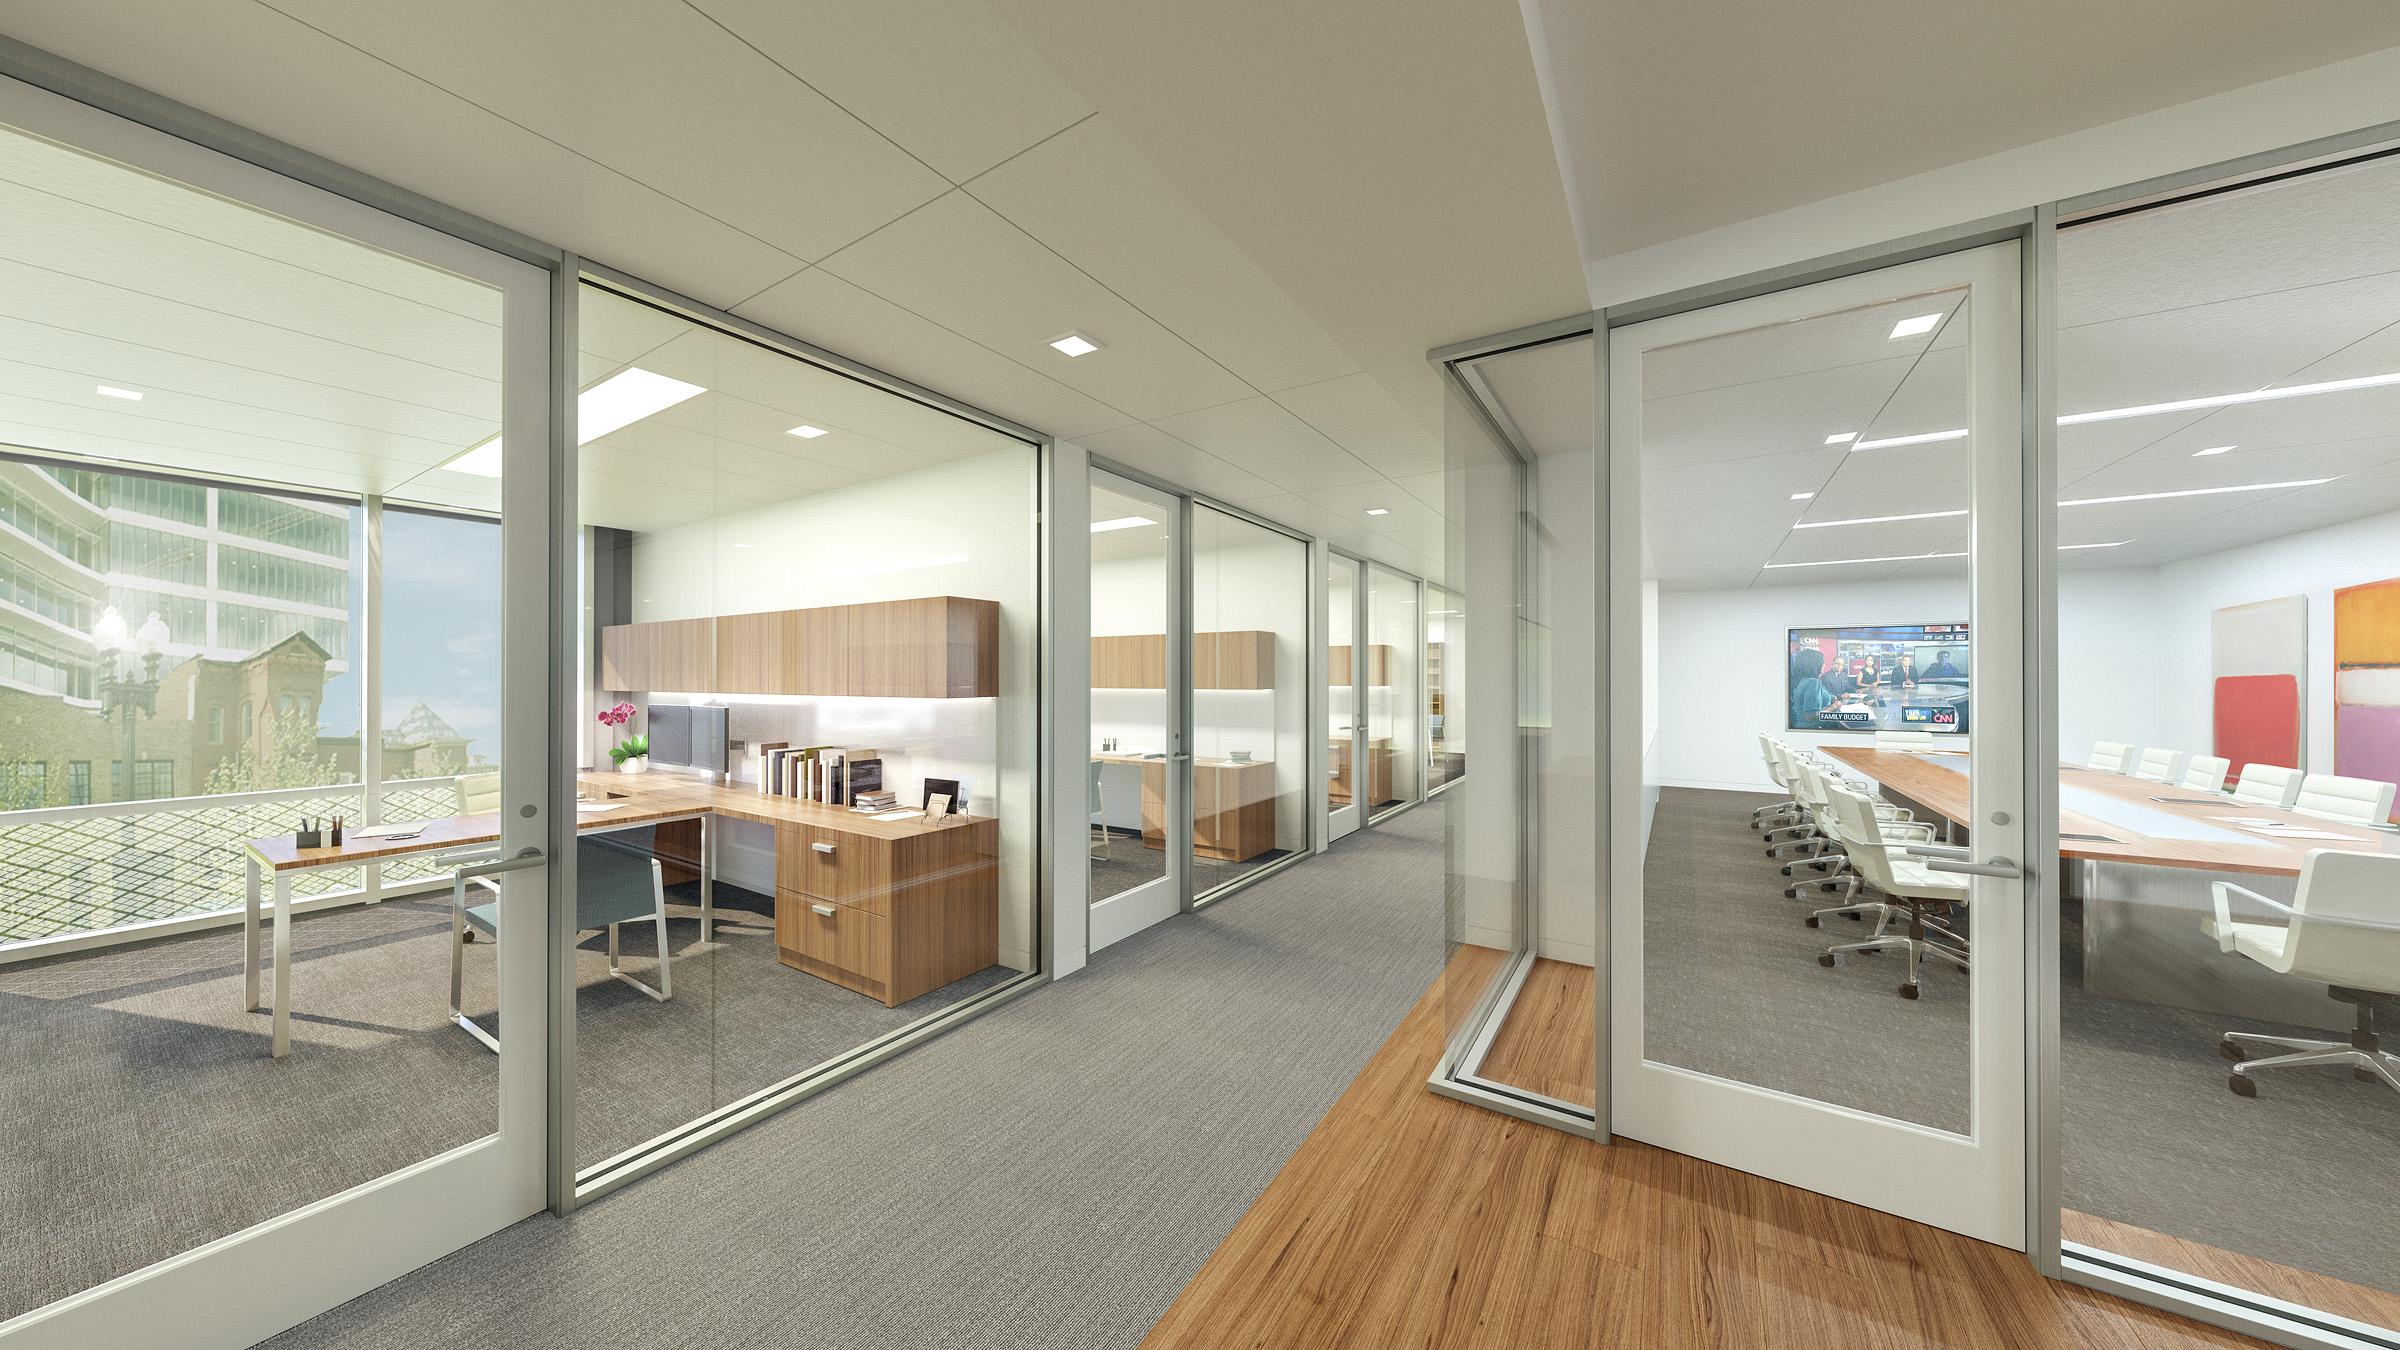 601 MASS AVE. NW   Washington, DC |  Client: HYL Architecture